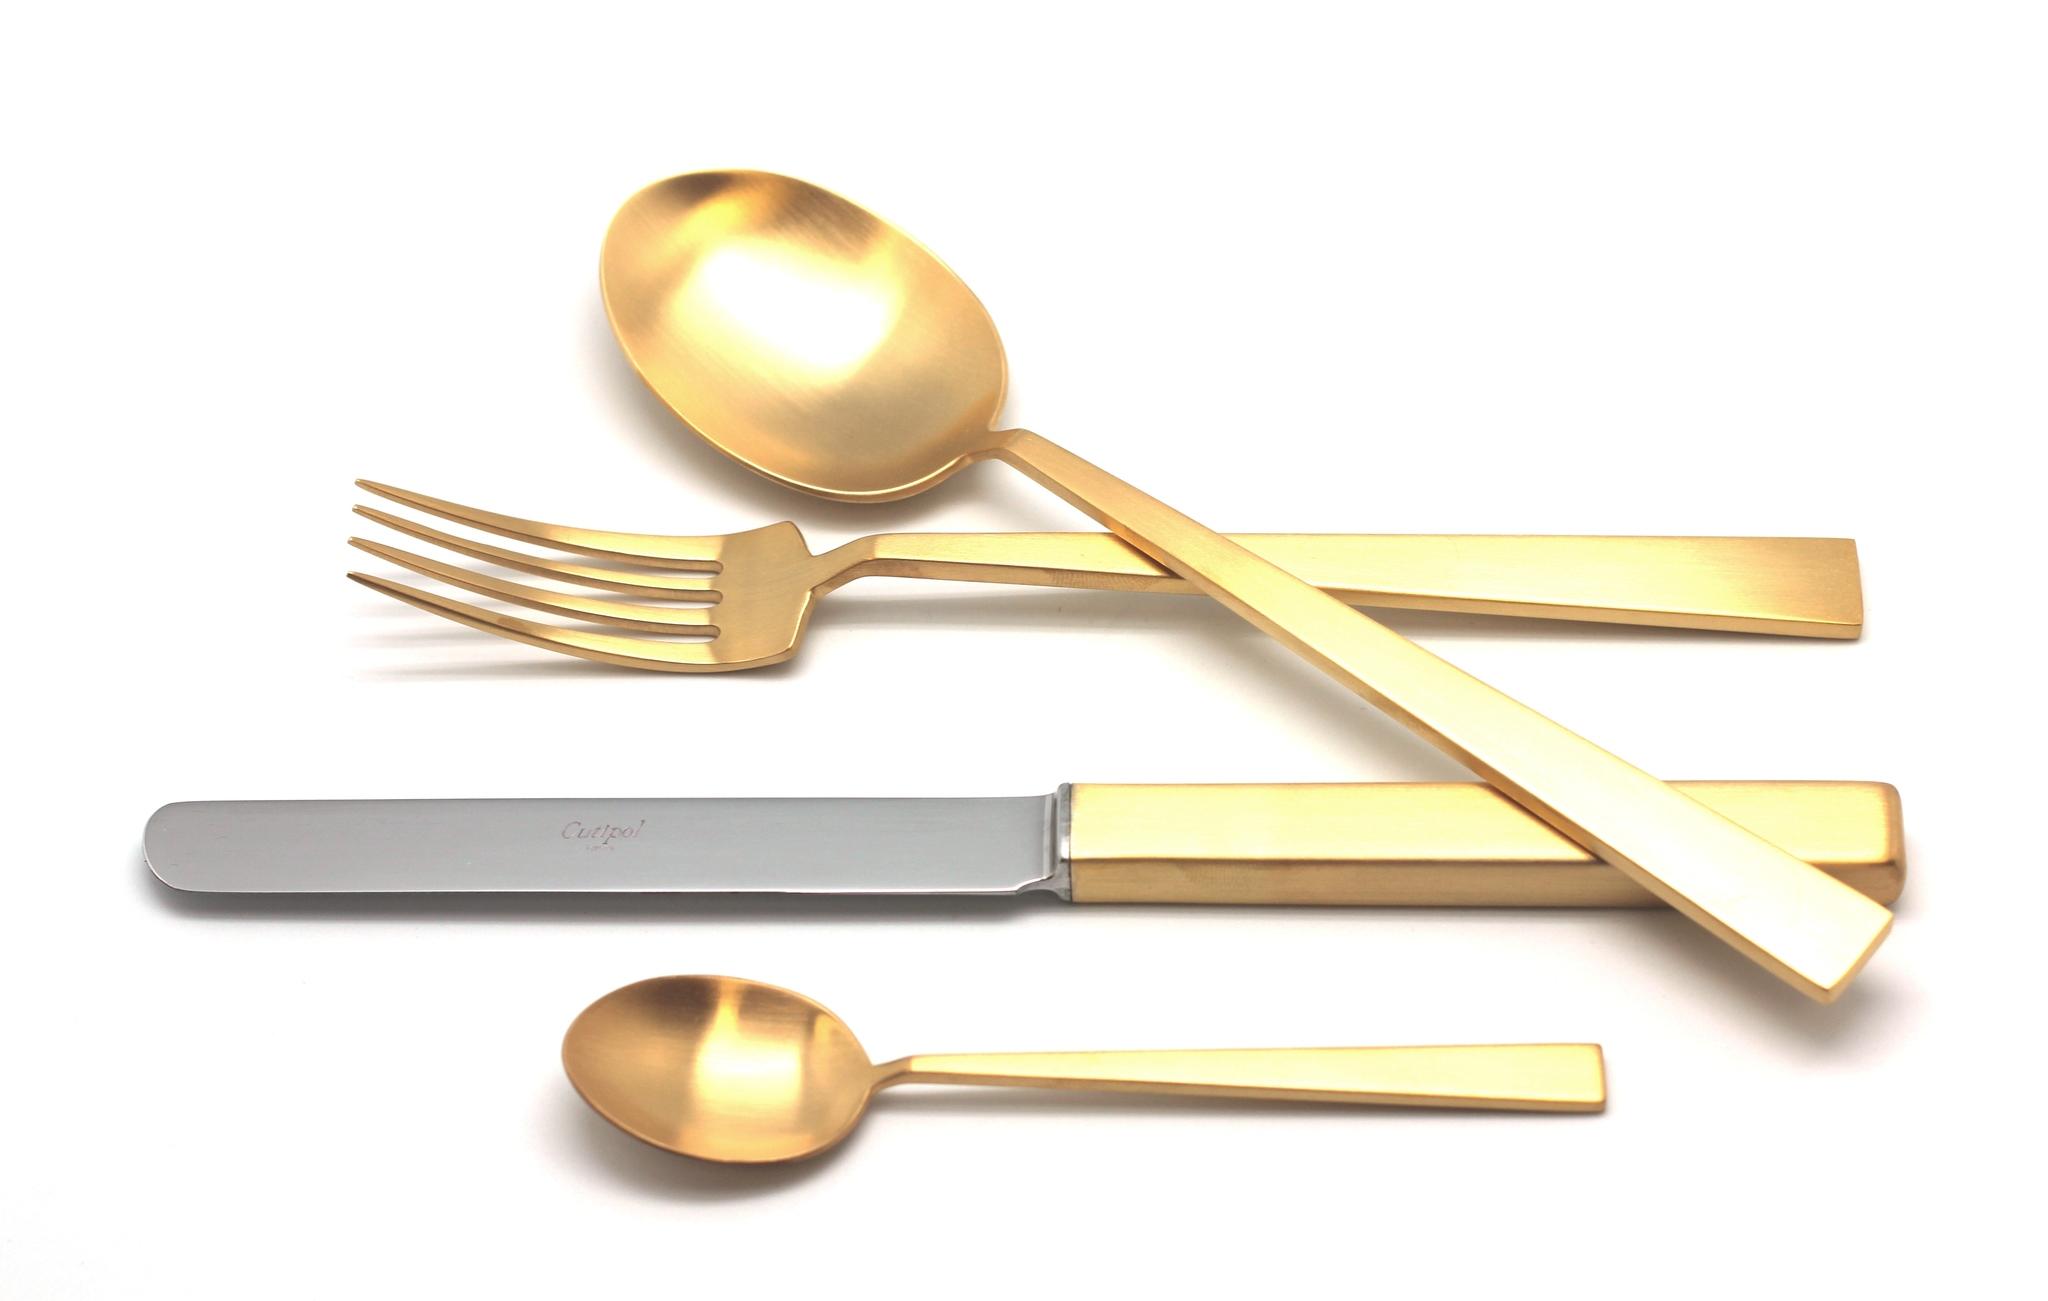 Набор 72 пр BAUHAUS GOLD, артикул 9322-72, производитель - Cutipol